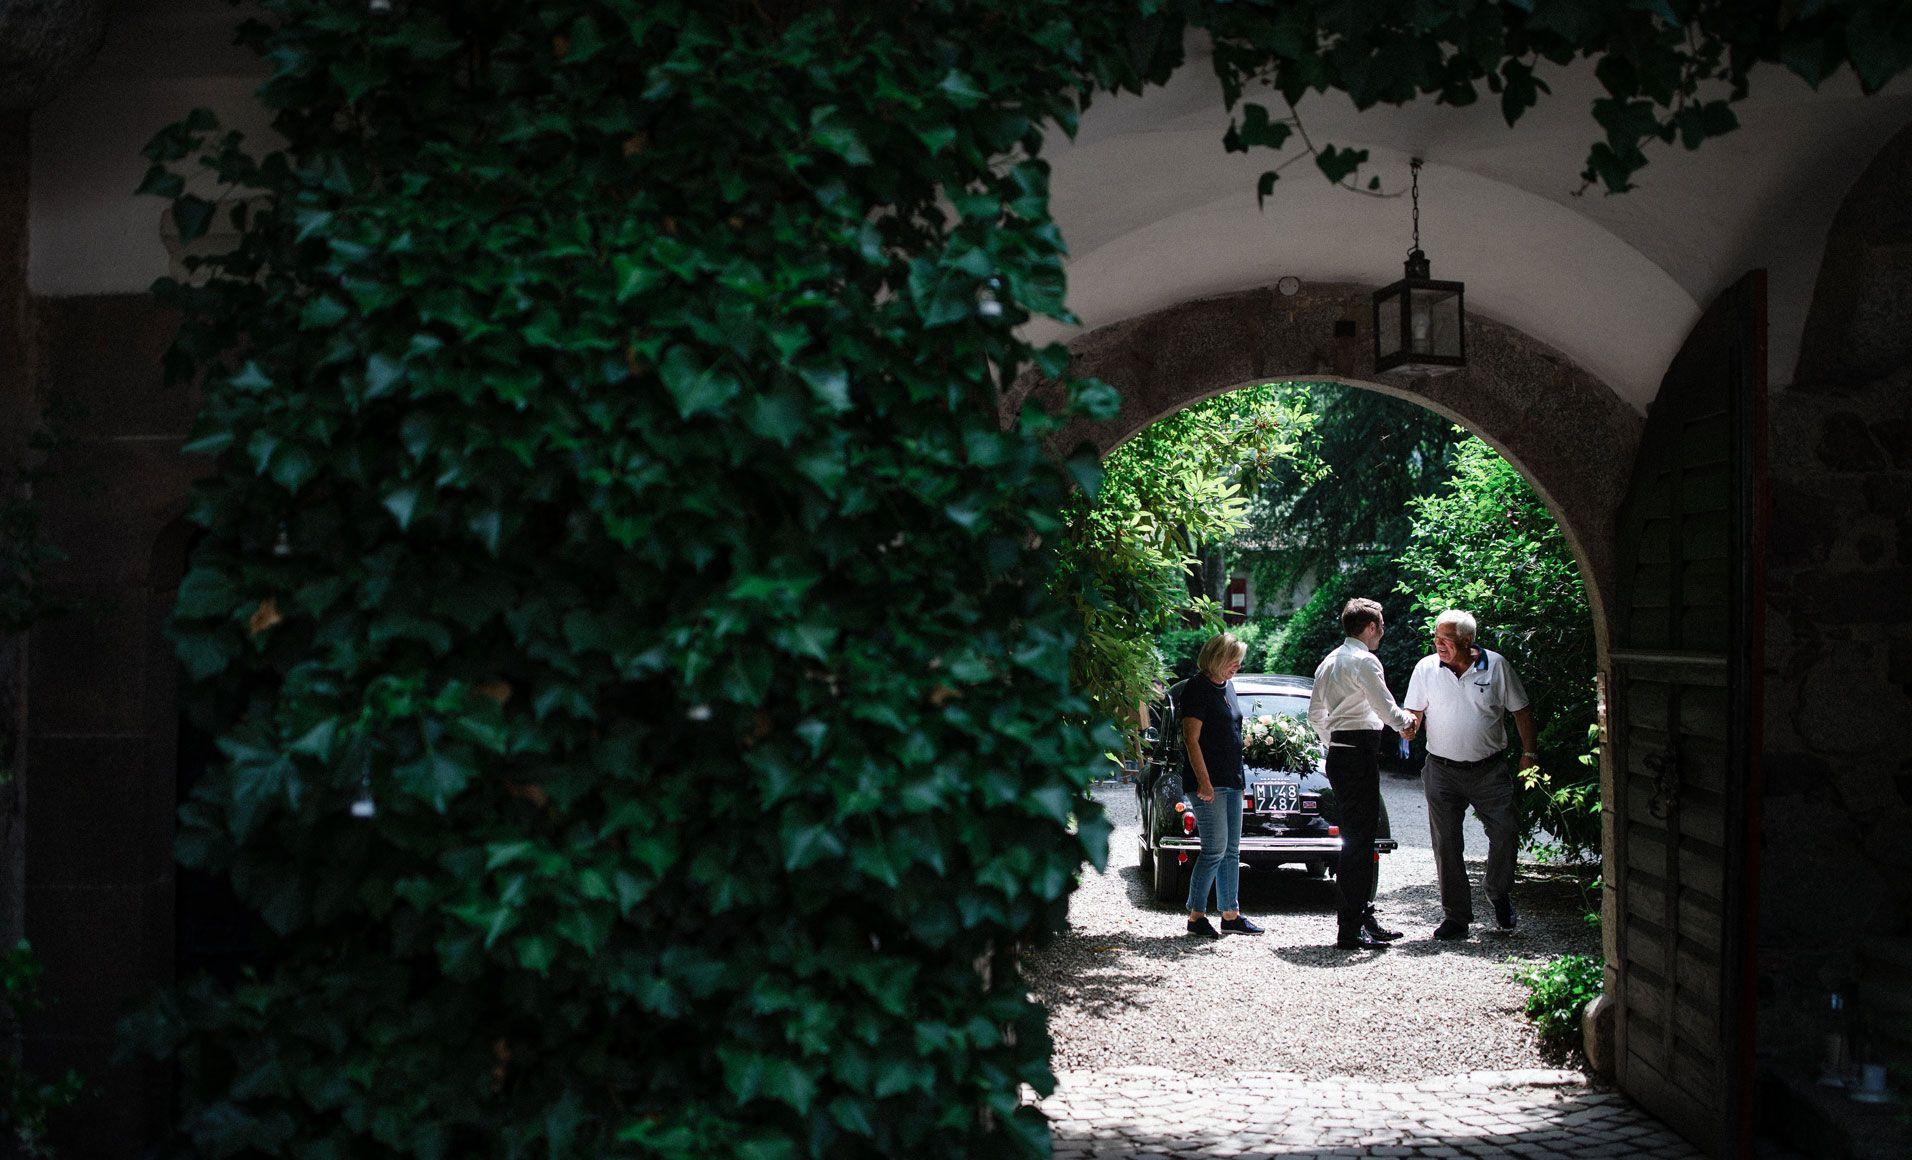 Castle Rubein Merano Weddings In Italy I Matrimonio A Castel Rubein Merano Alto Adige I Hochzeit In 2020 Sudtirol Italien Hochzeit Catering Bozen Sudtirol